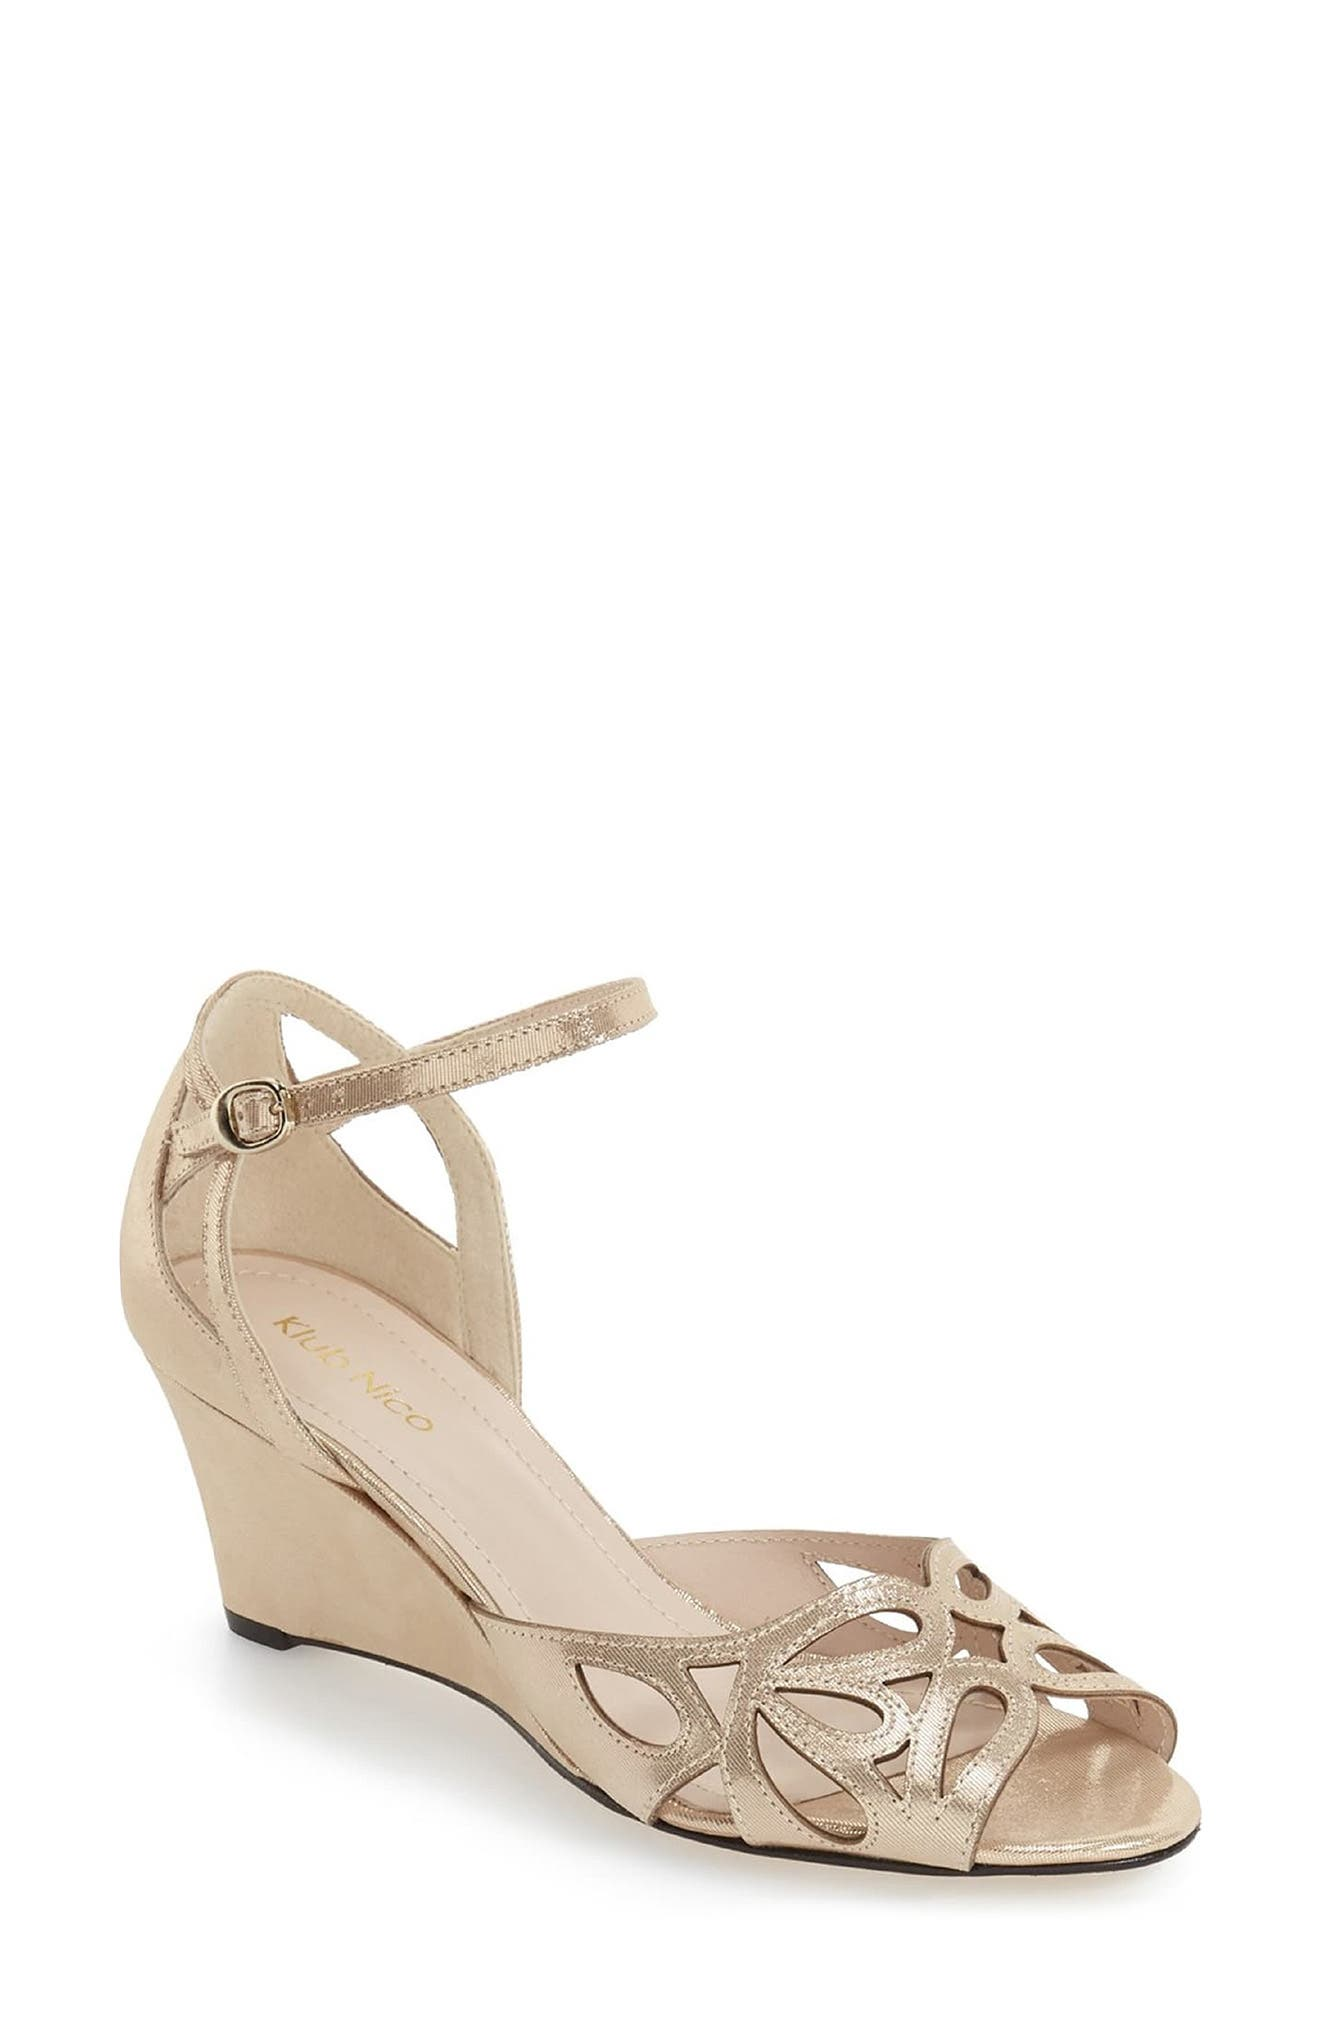 'Kismet' Wedge Sandal